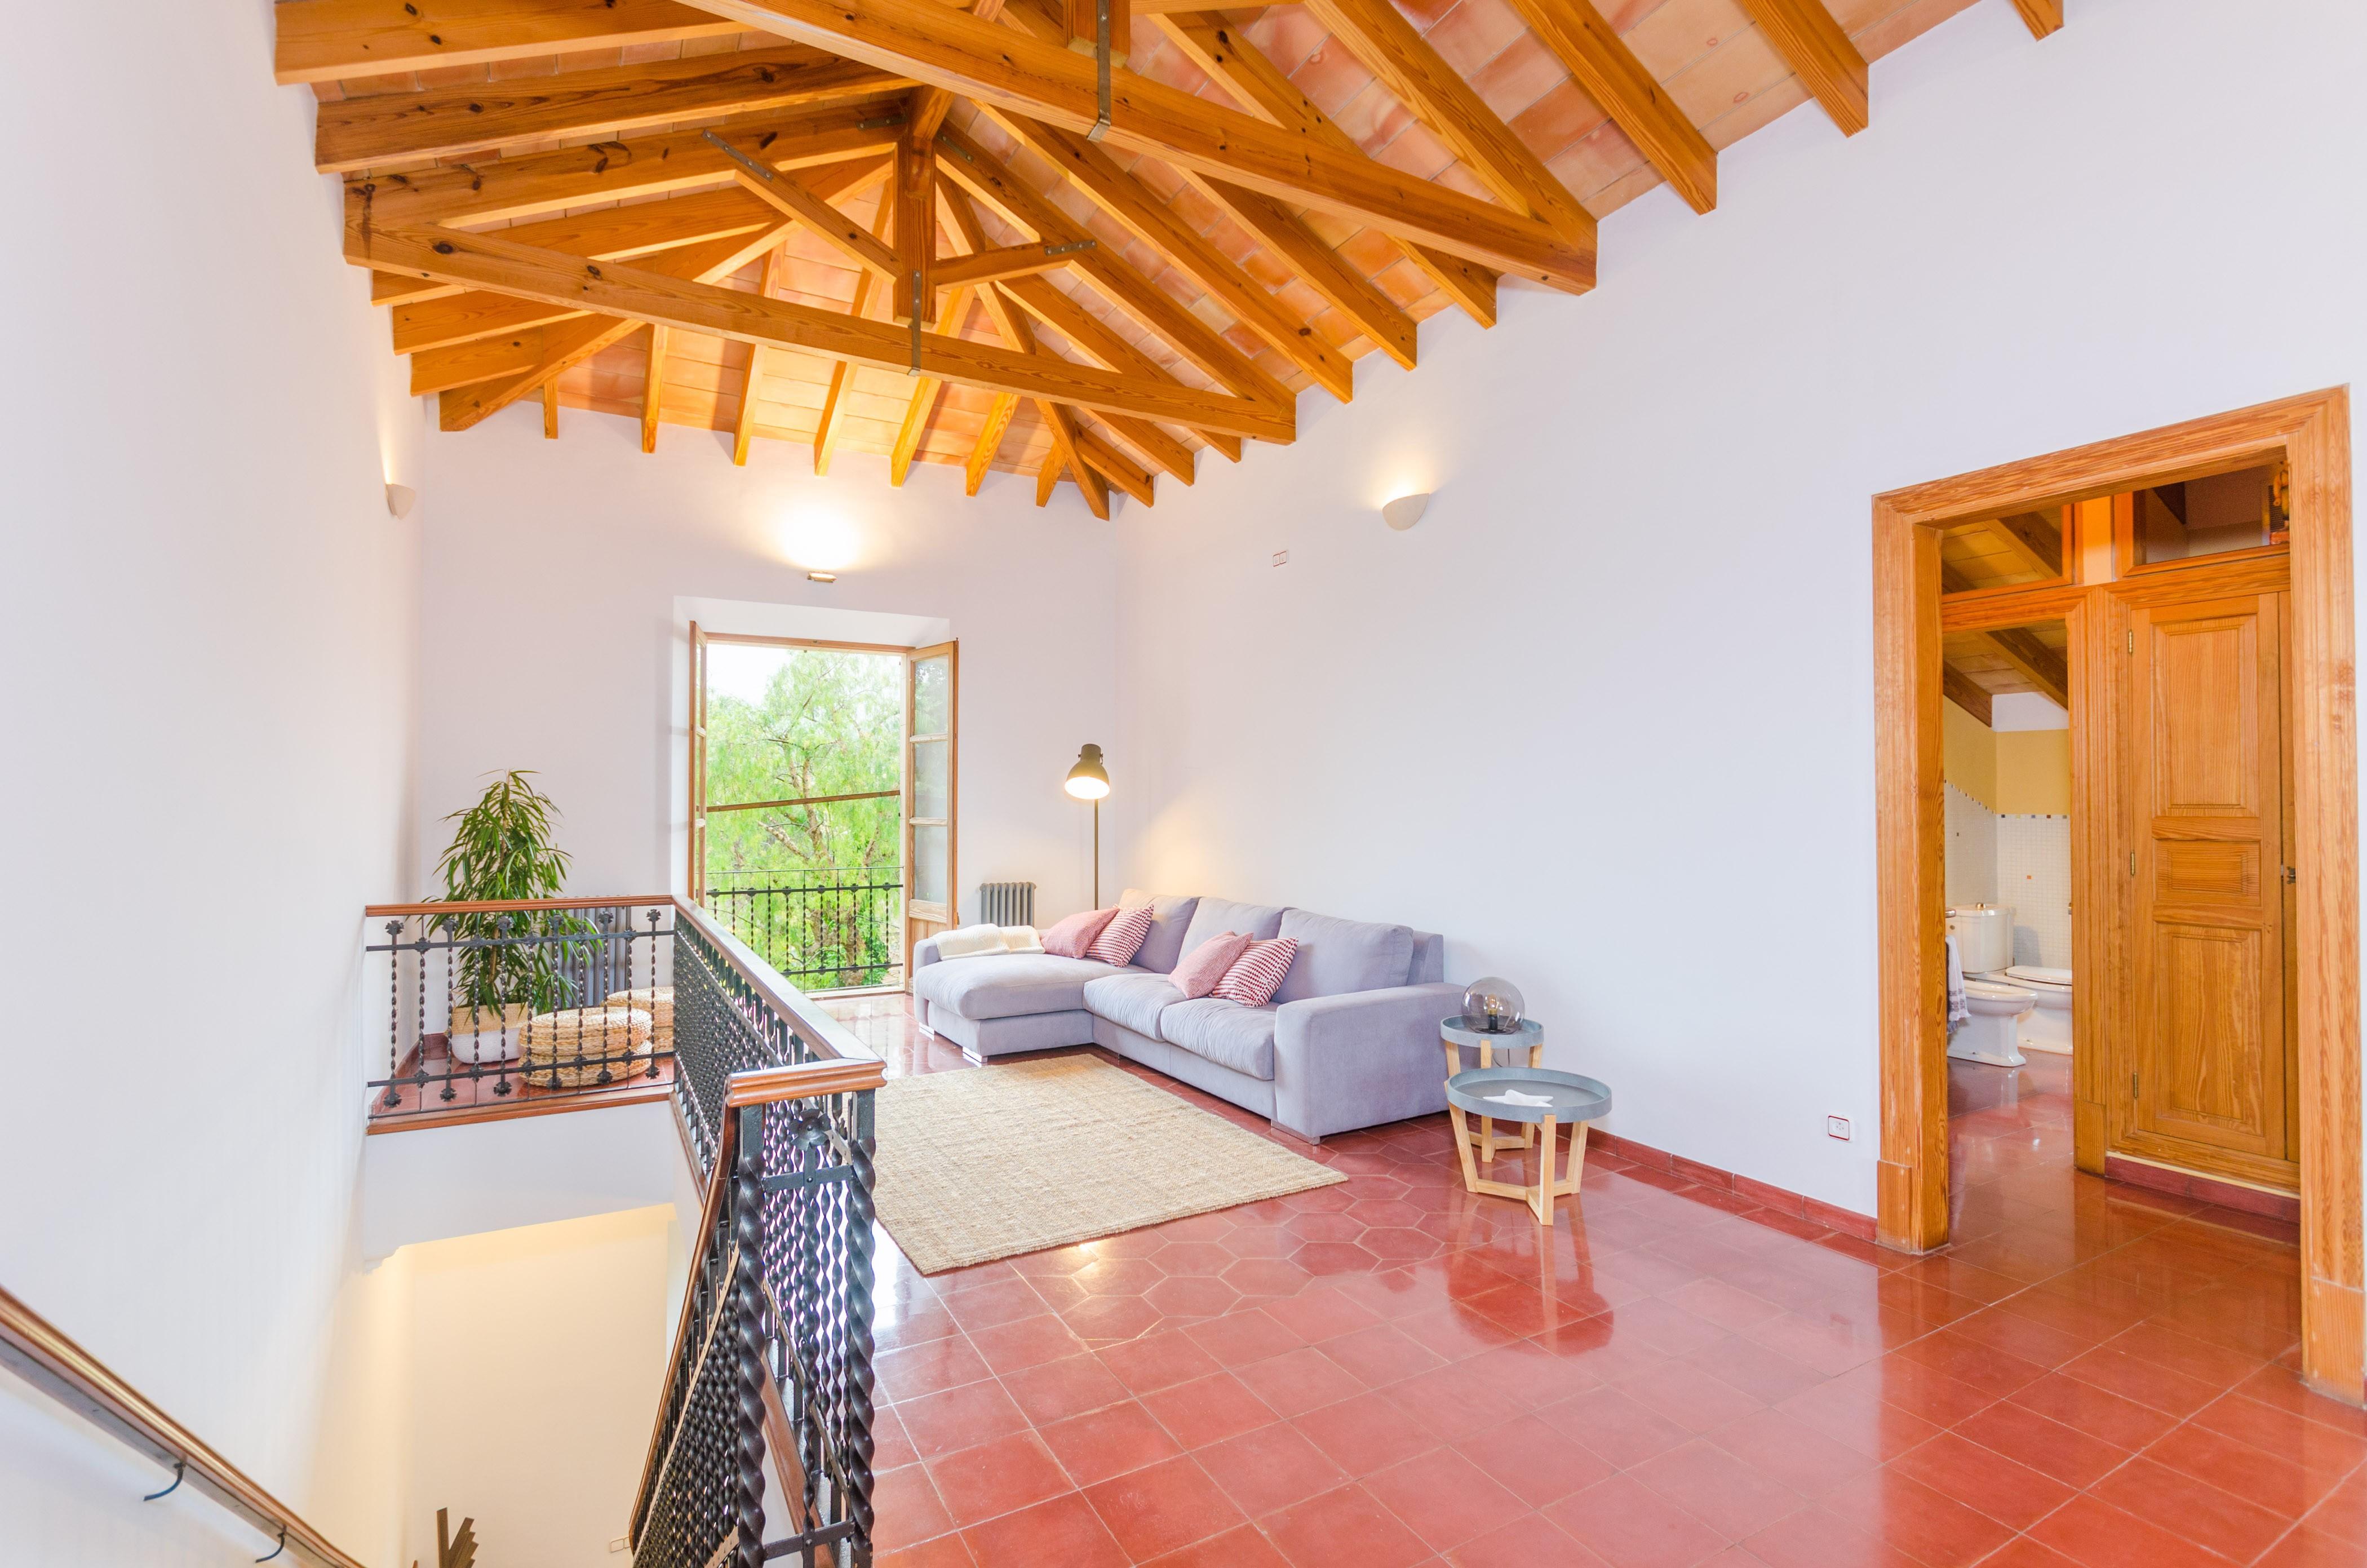 Maison de vacances CAS CONVIDATS (2435013), Alaro, Majorque, Iles Baléares, Espagne, image 40